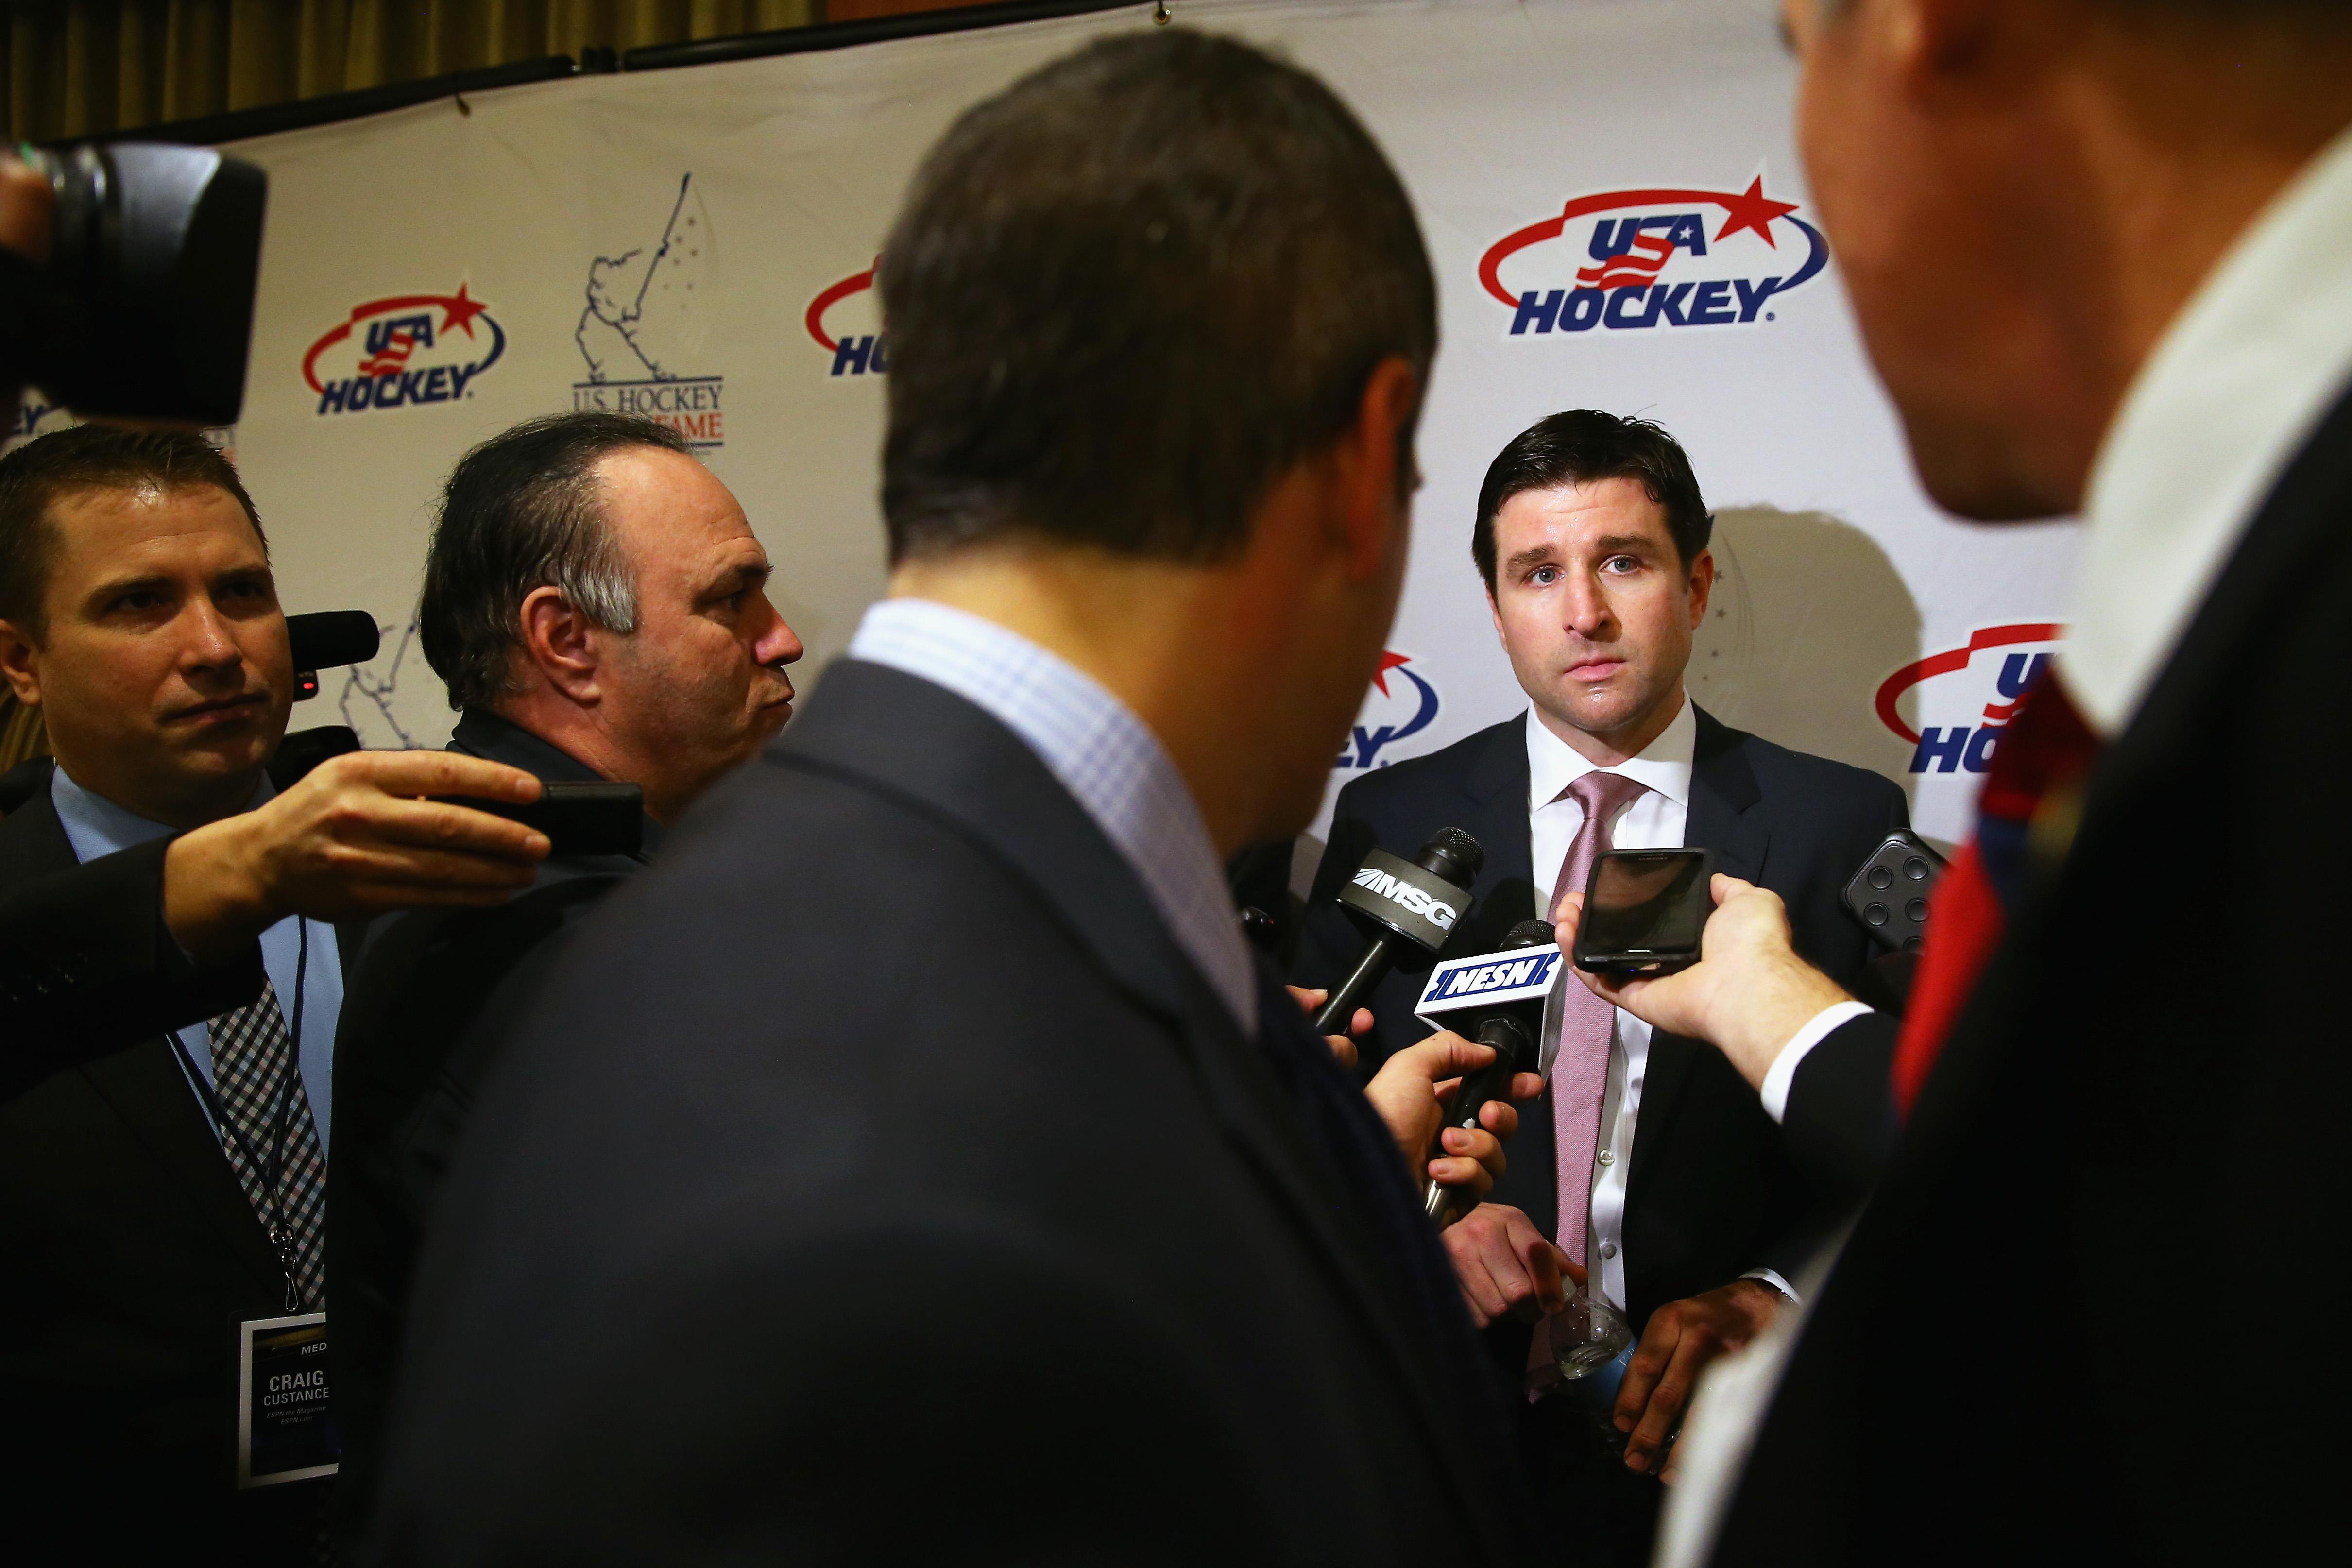 U.S. Hockey Hall Of Fame Induction